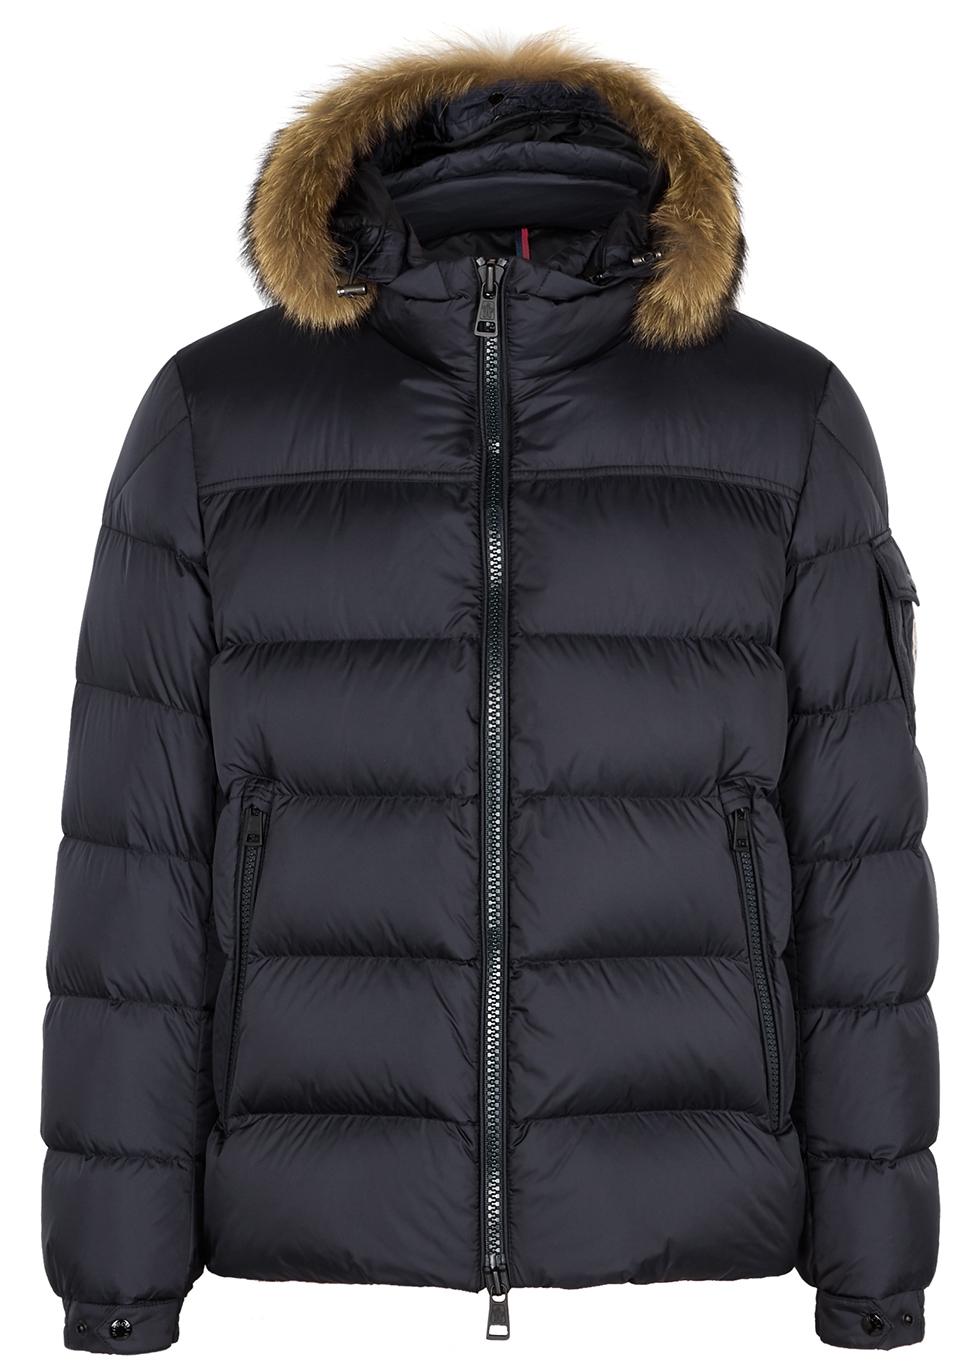 Details about Moncler K2 Down Puffer Jacket Parka sz 6 XXL Brown Maya